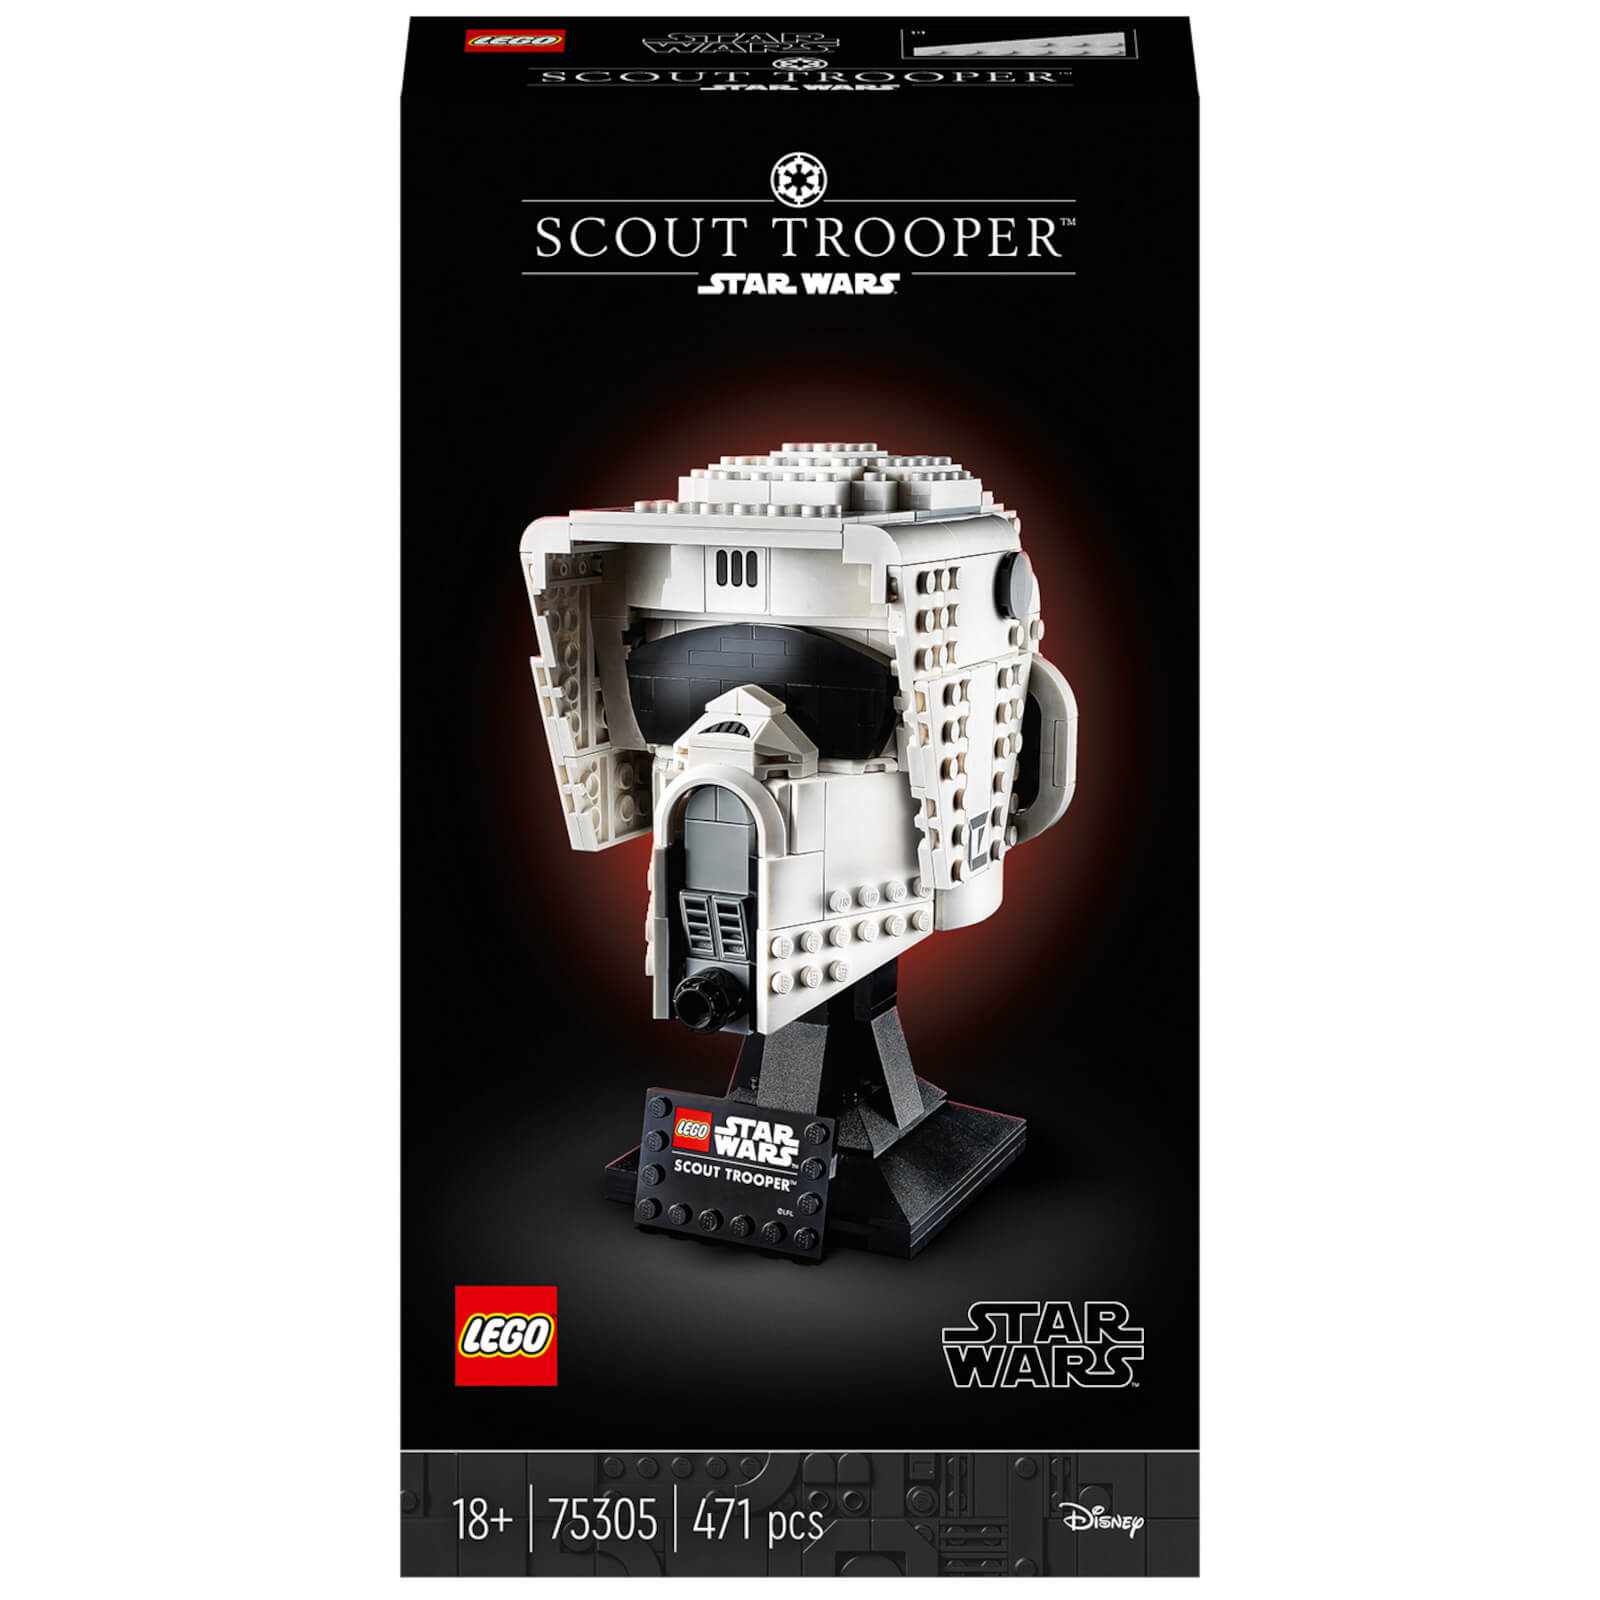 LEGO Star Wars: Scout Trooper Helmet Collectable Model (75305)